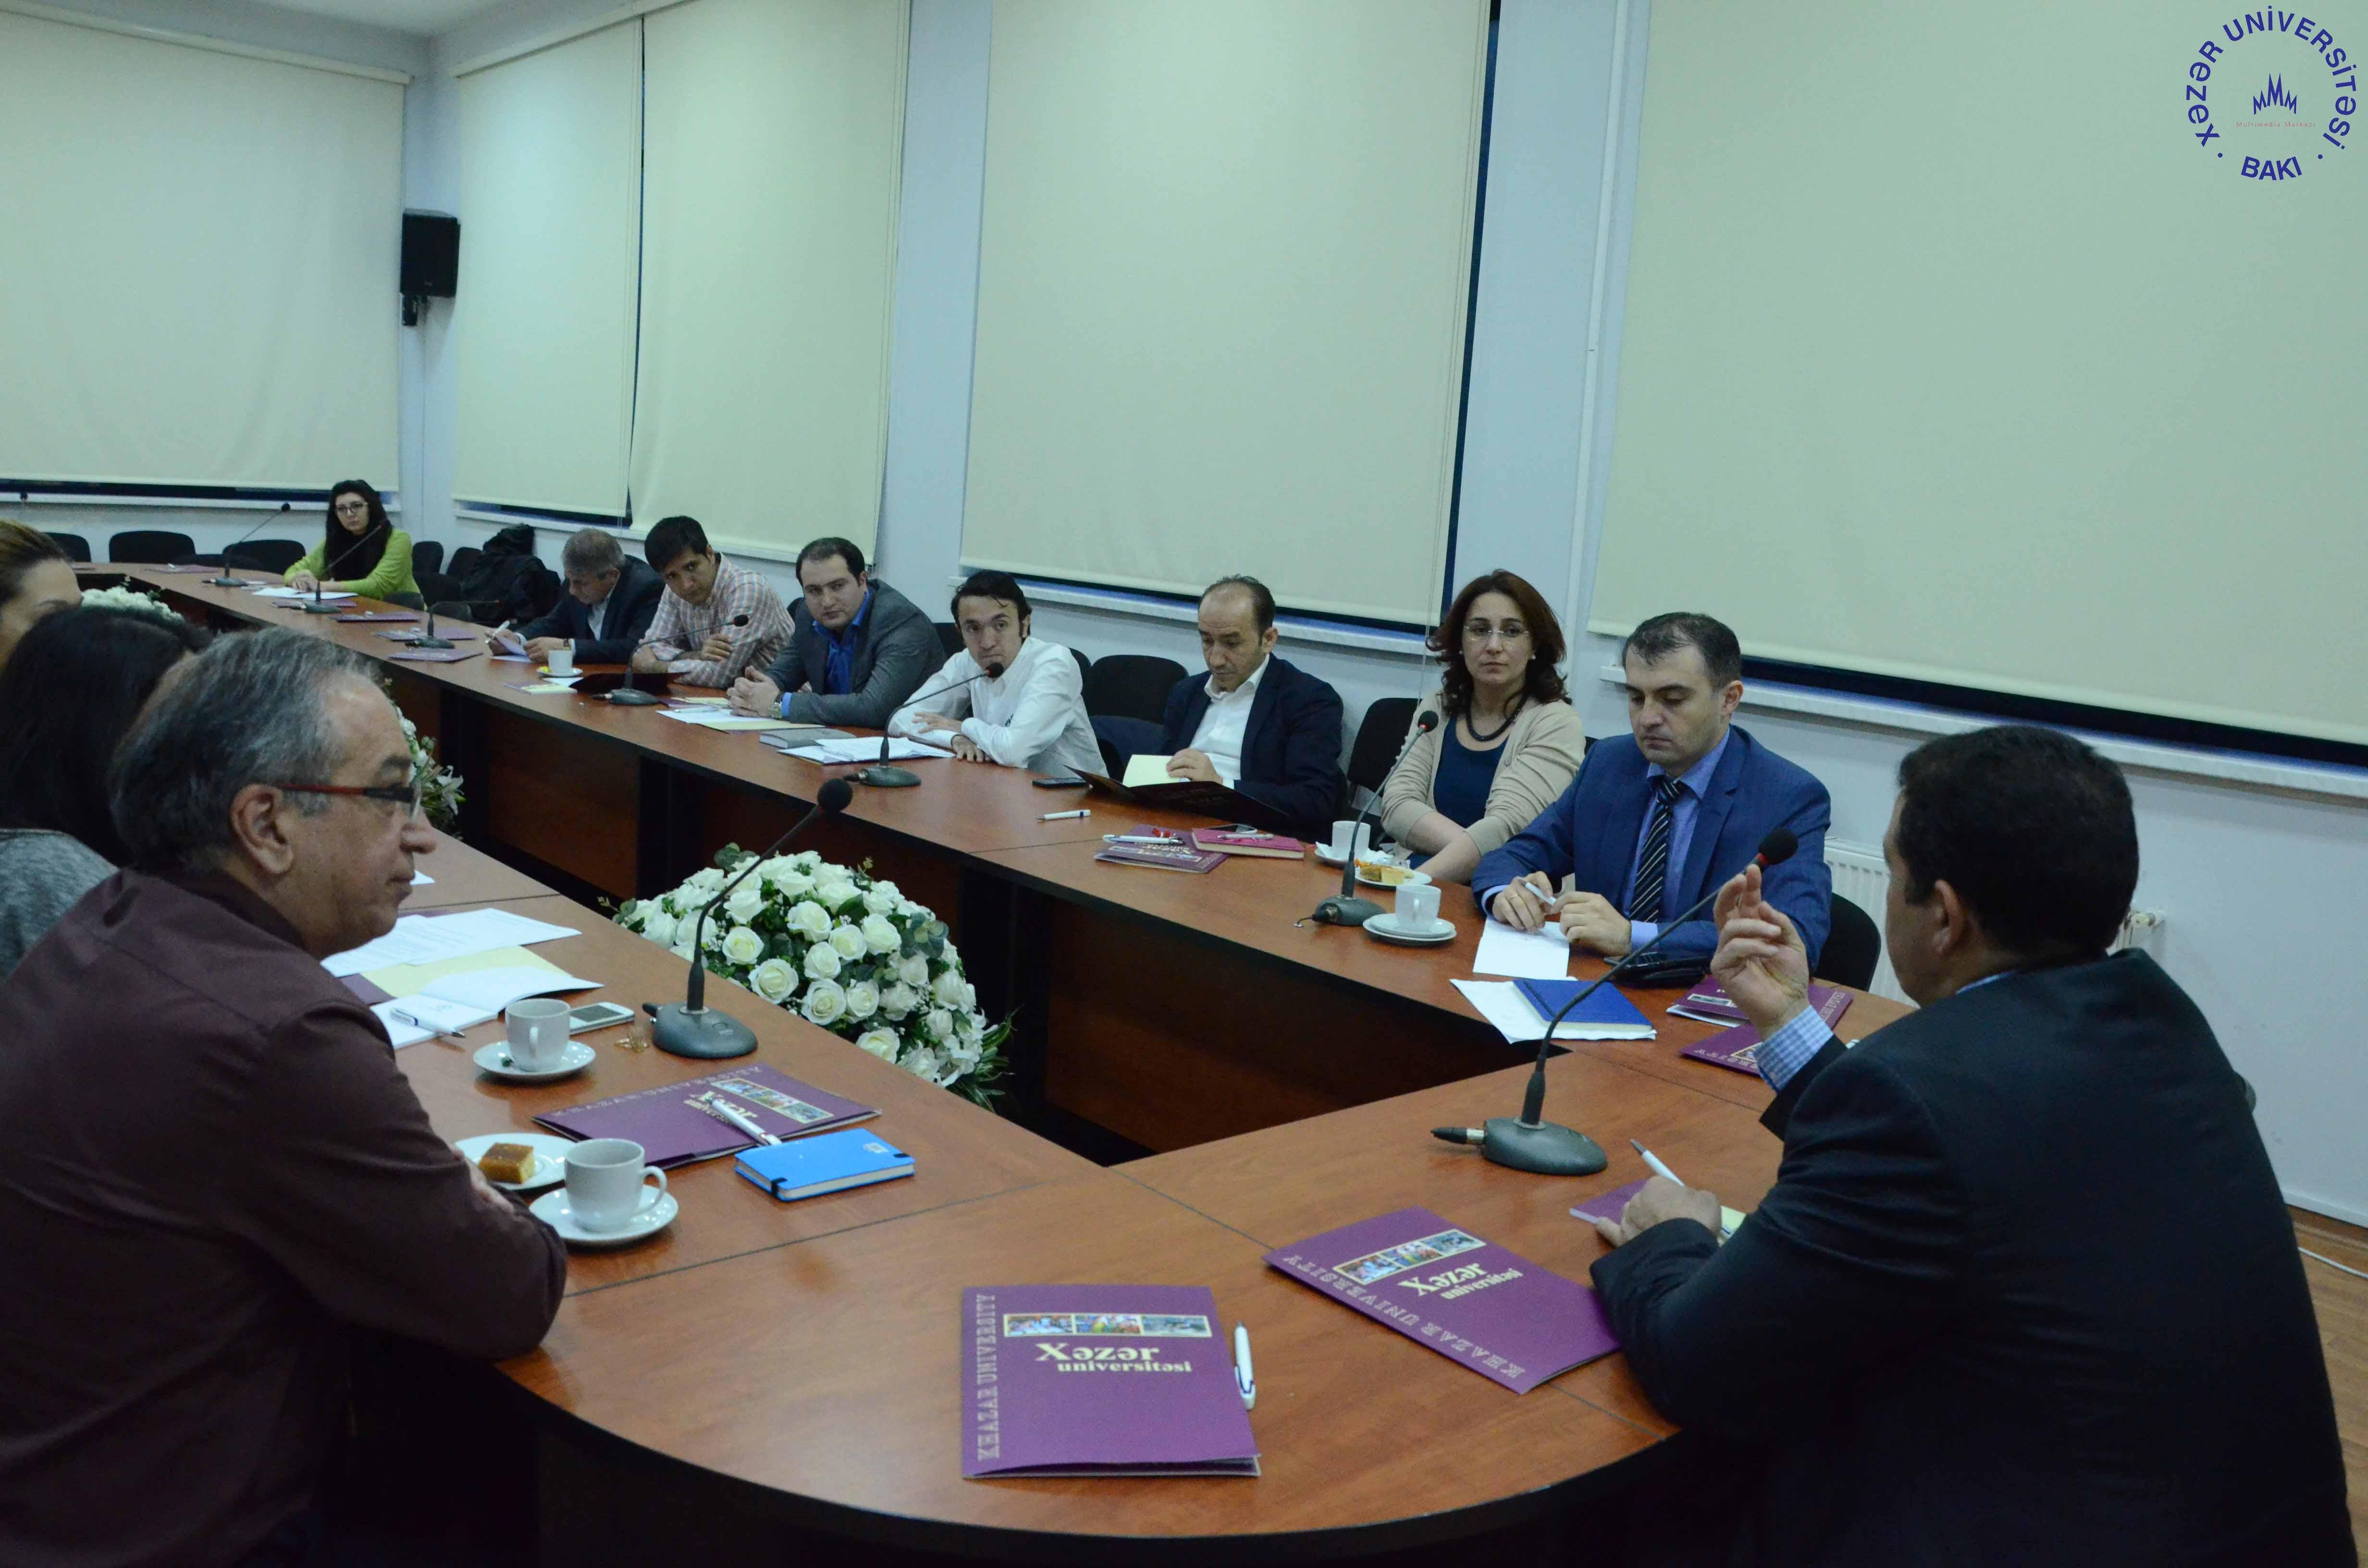 Alumni Working Group Meeting